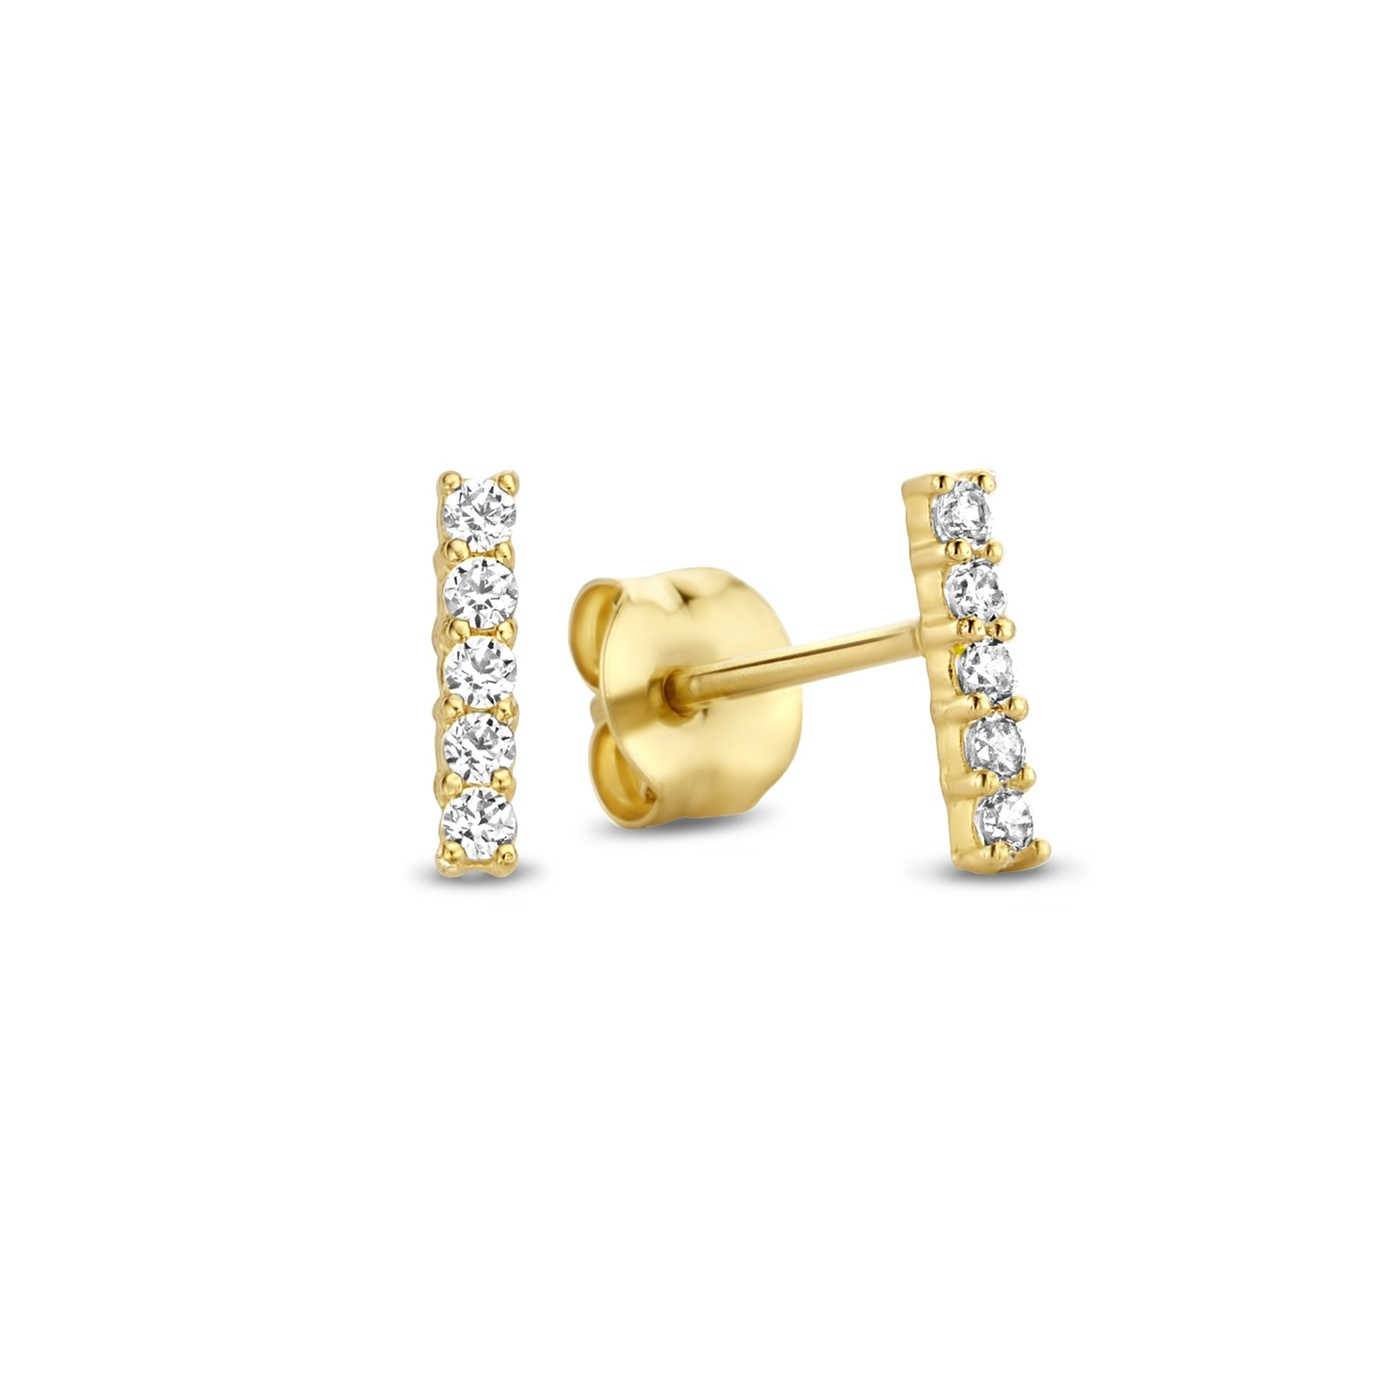 Isabel Bernard Rivoli Esmée 14 carat gold ear studs